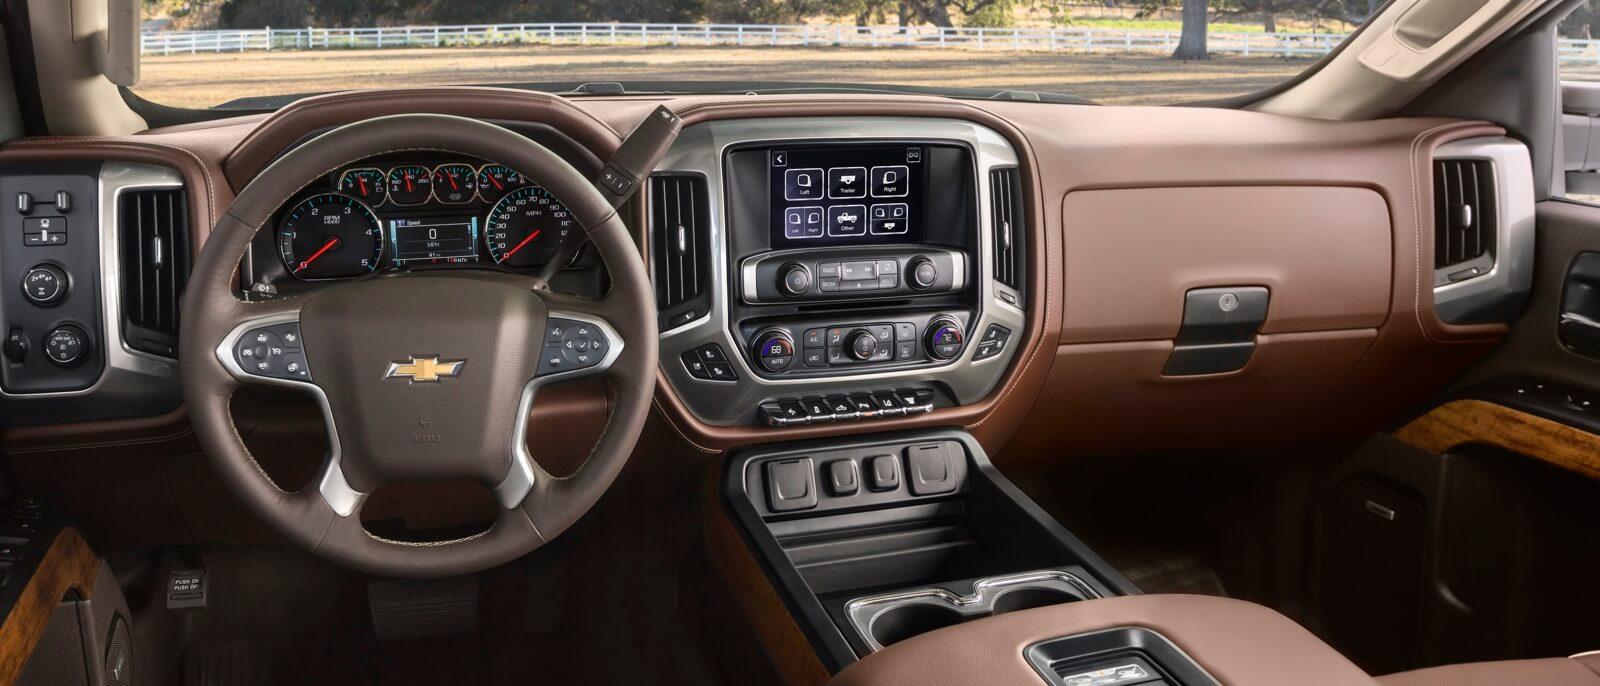 2017 Chevrolet Silverado 2500HD Pickup Truck